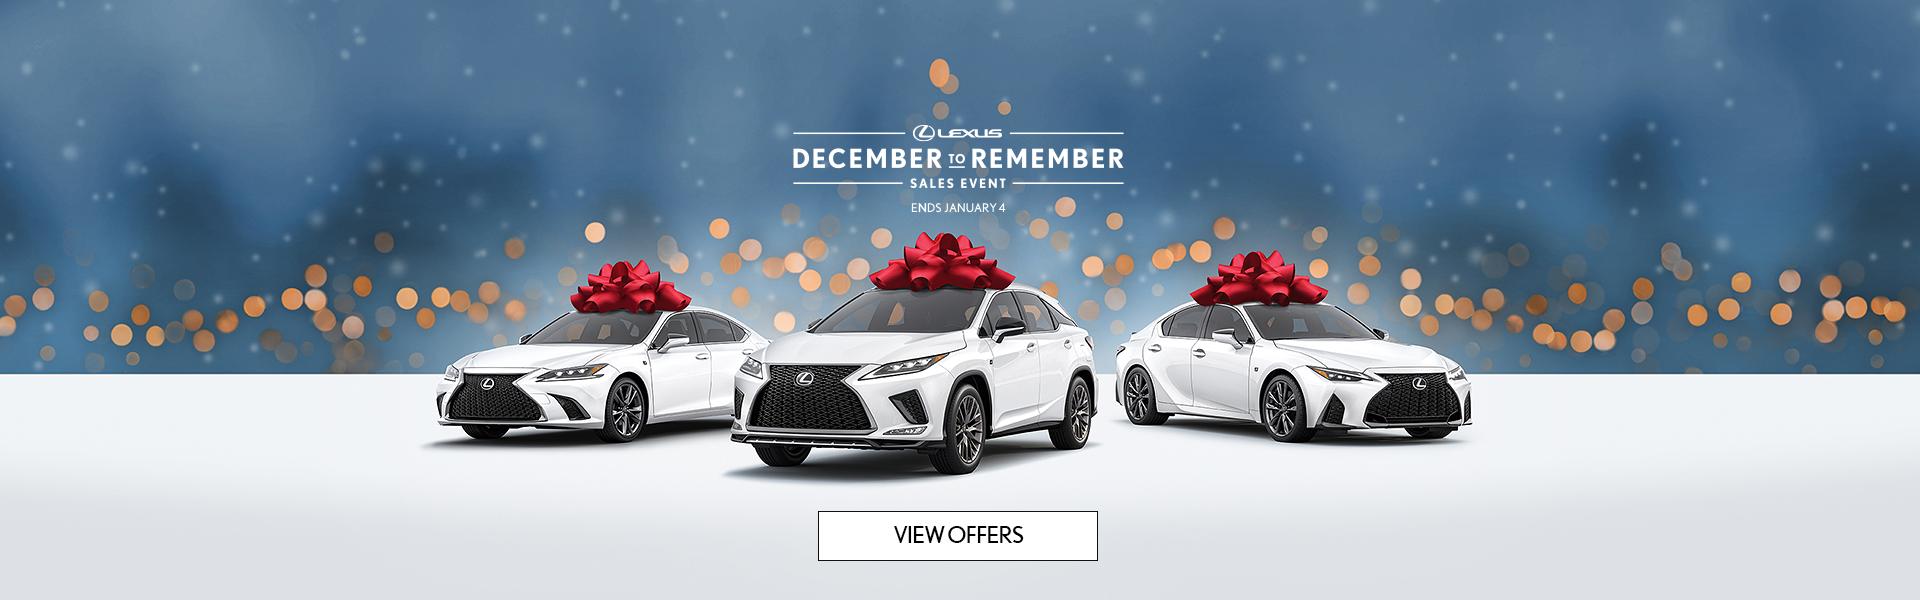 December to Remember – Homepage Slider – Jan 4